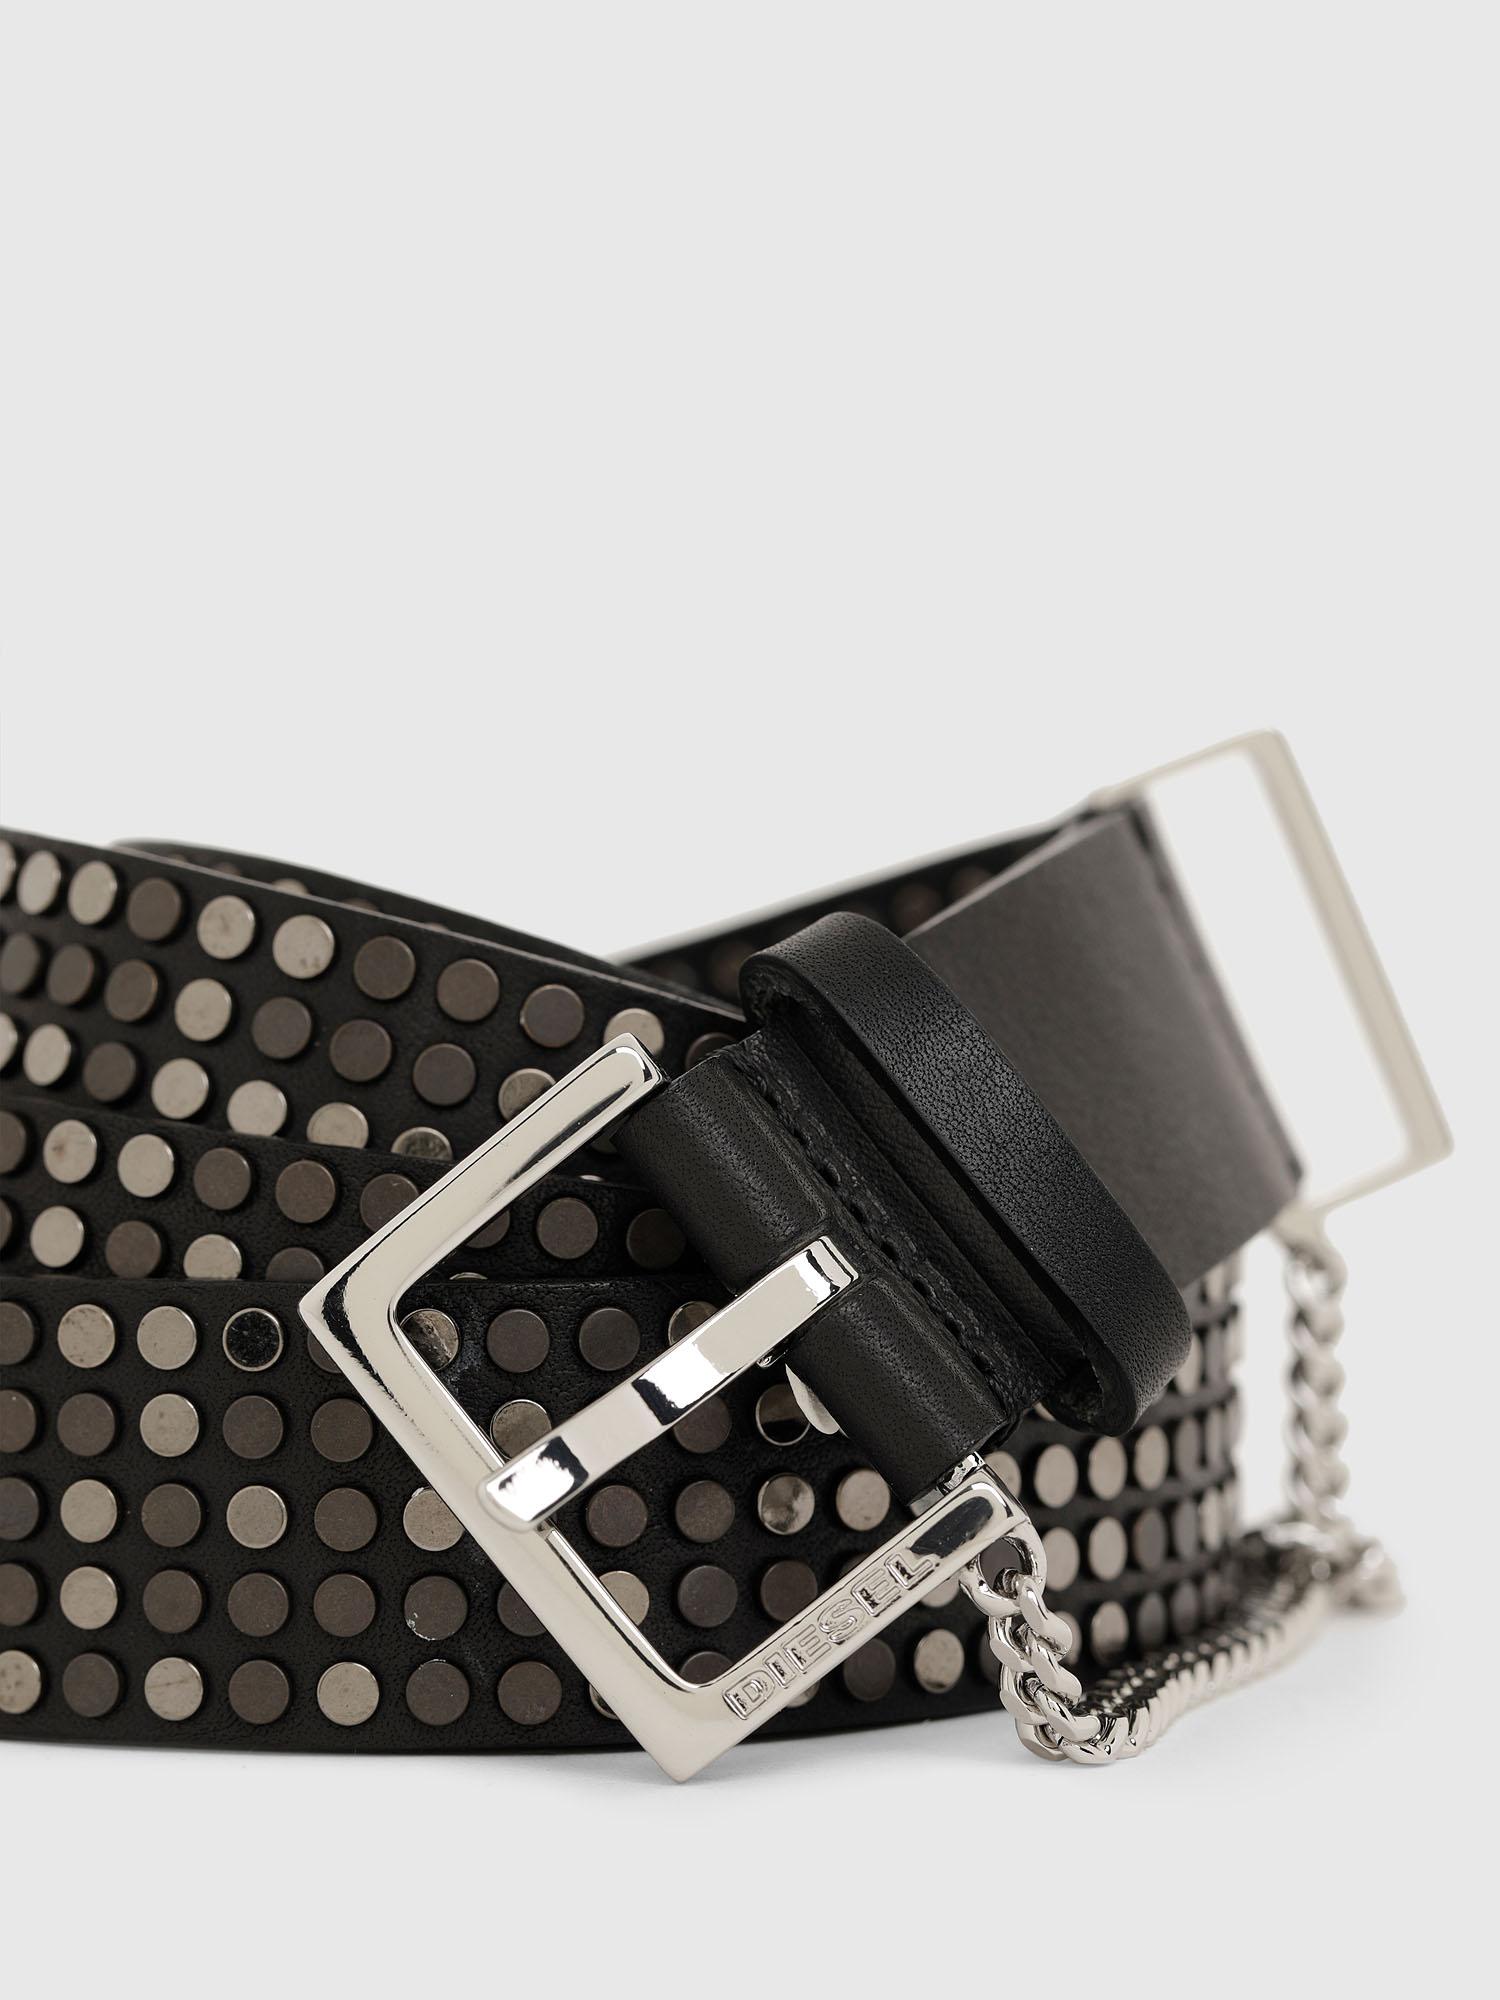 Diesel - B-STAD, Black - Belts - Image 2